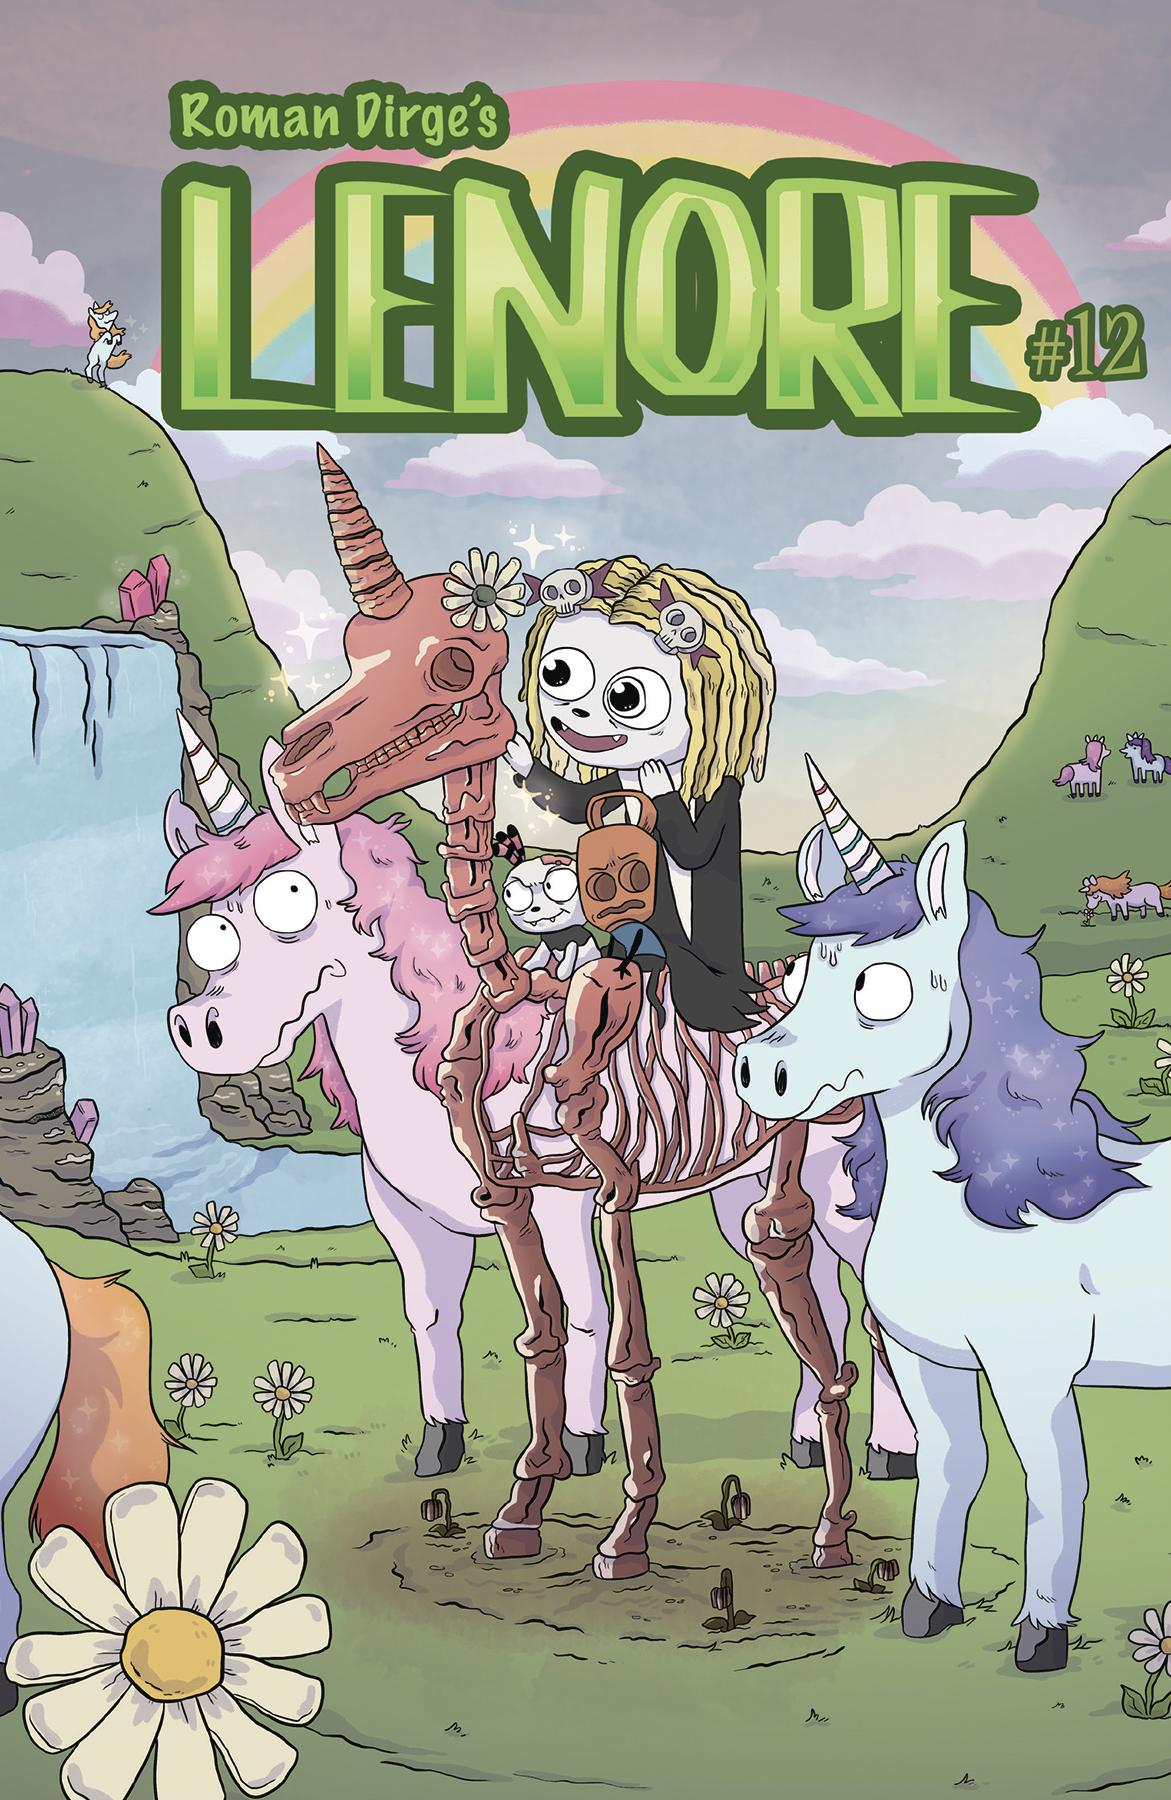 LENORE VOLUME III #1 CVR A GRALEY (RES)